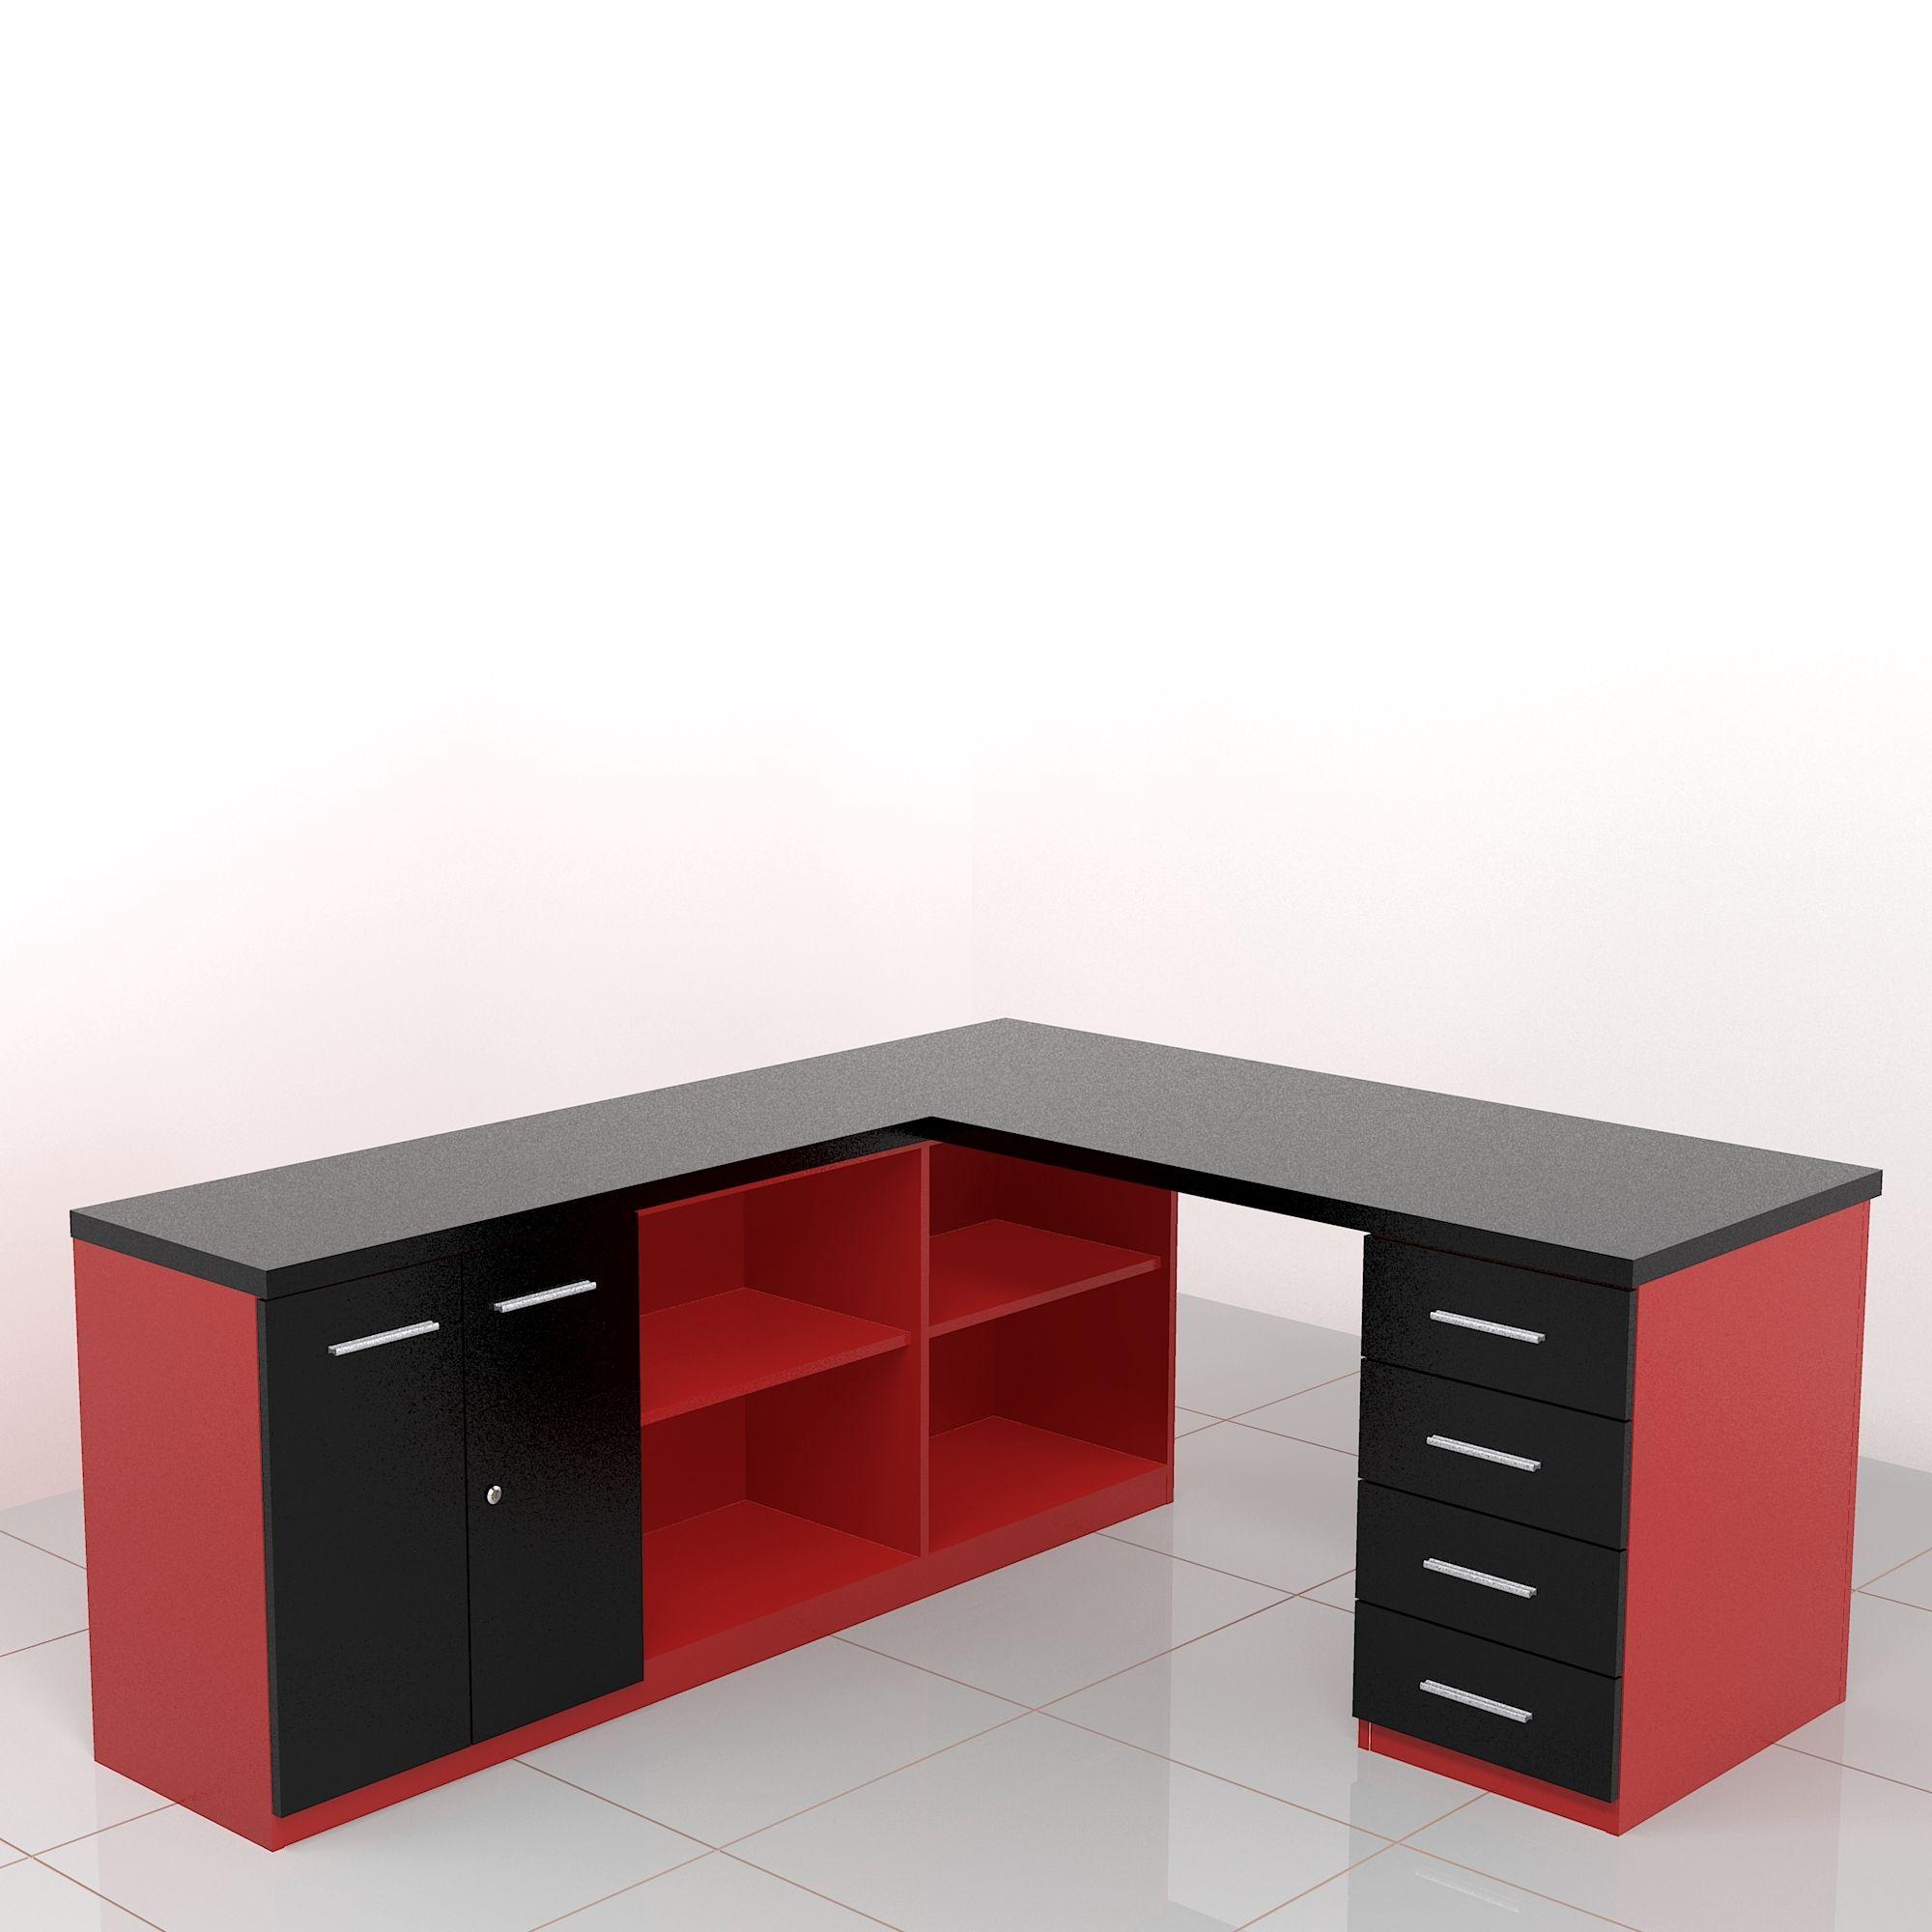 Groovy biurko narożne ALFA-NSD black and red Bartnikowski Meble Biurowe FP38